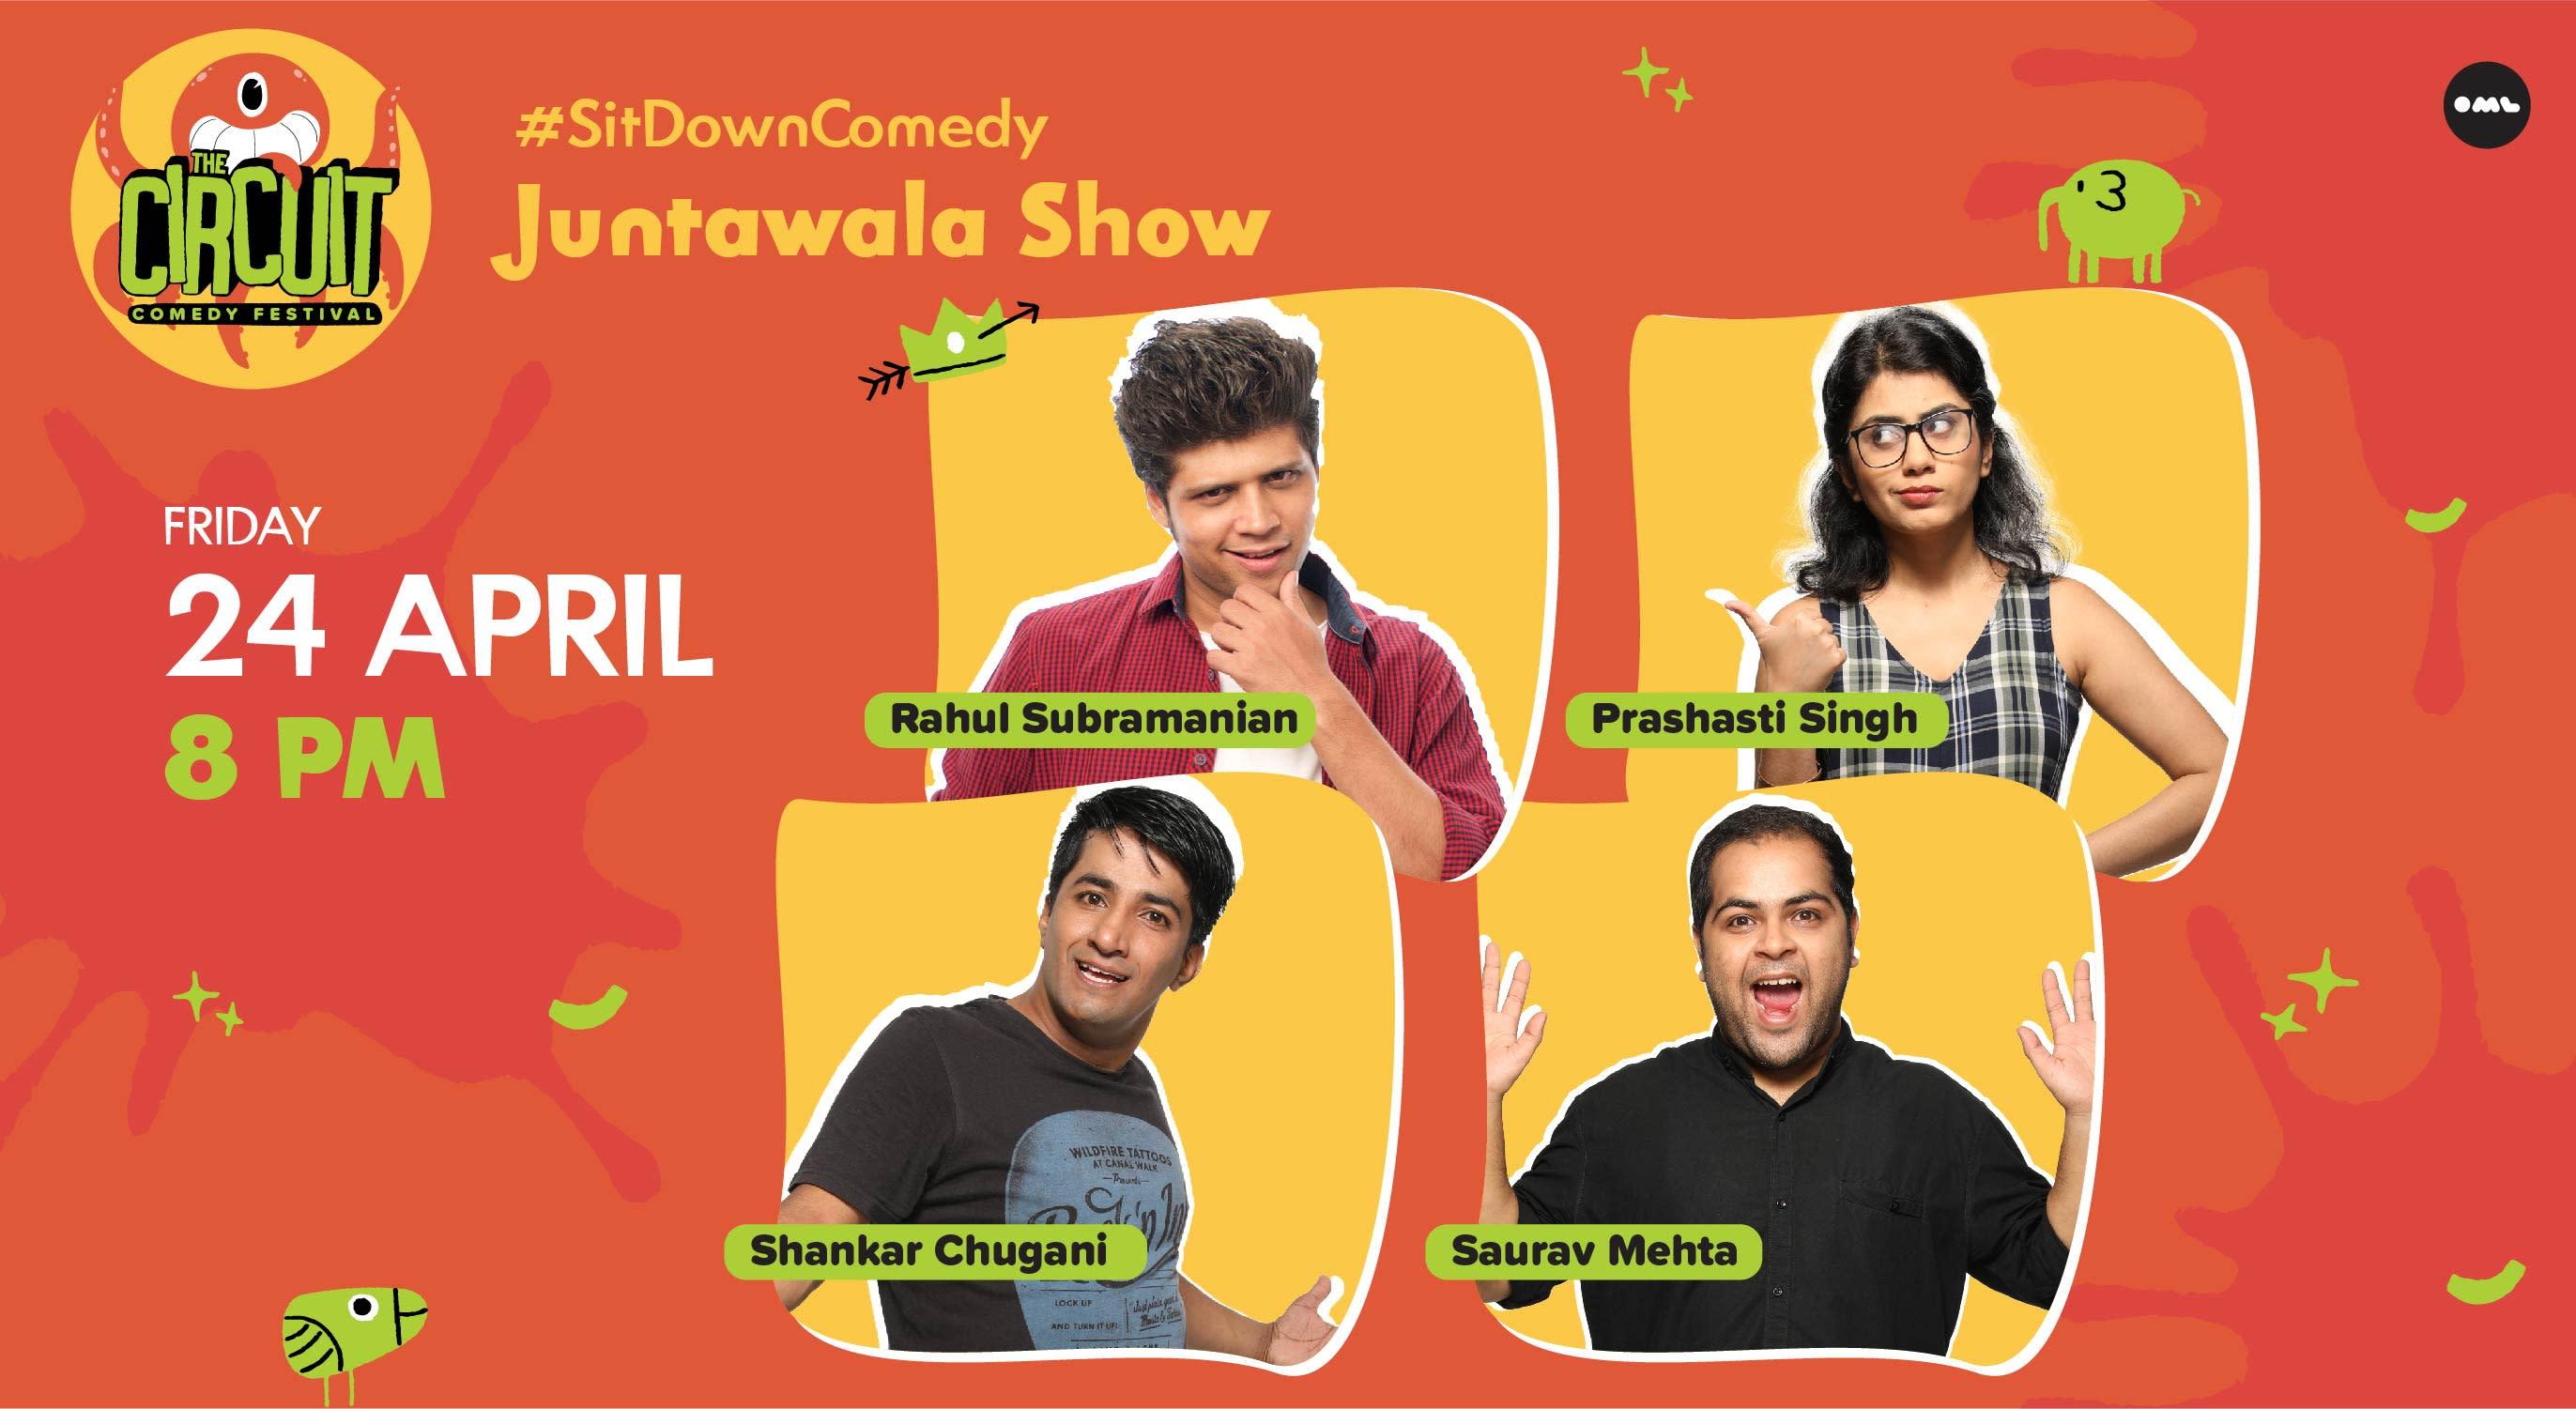 Juntawala Show ft. Rahul Subramanian, Prashasti Singh & more